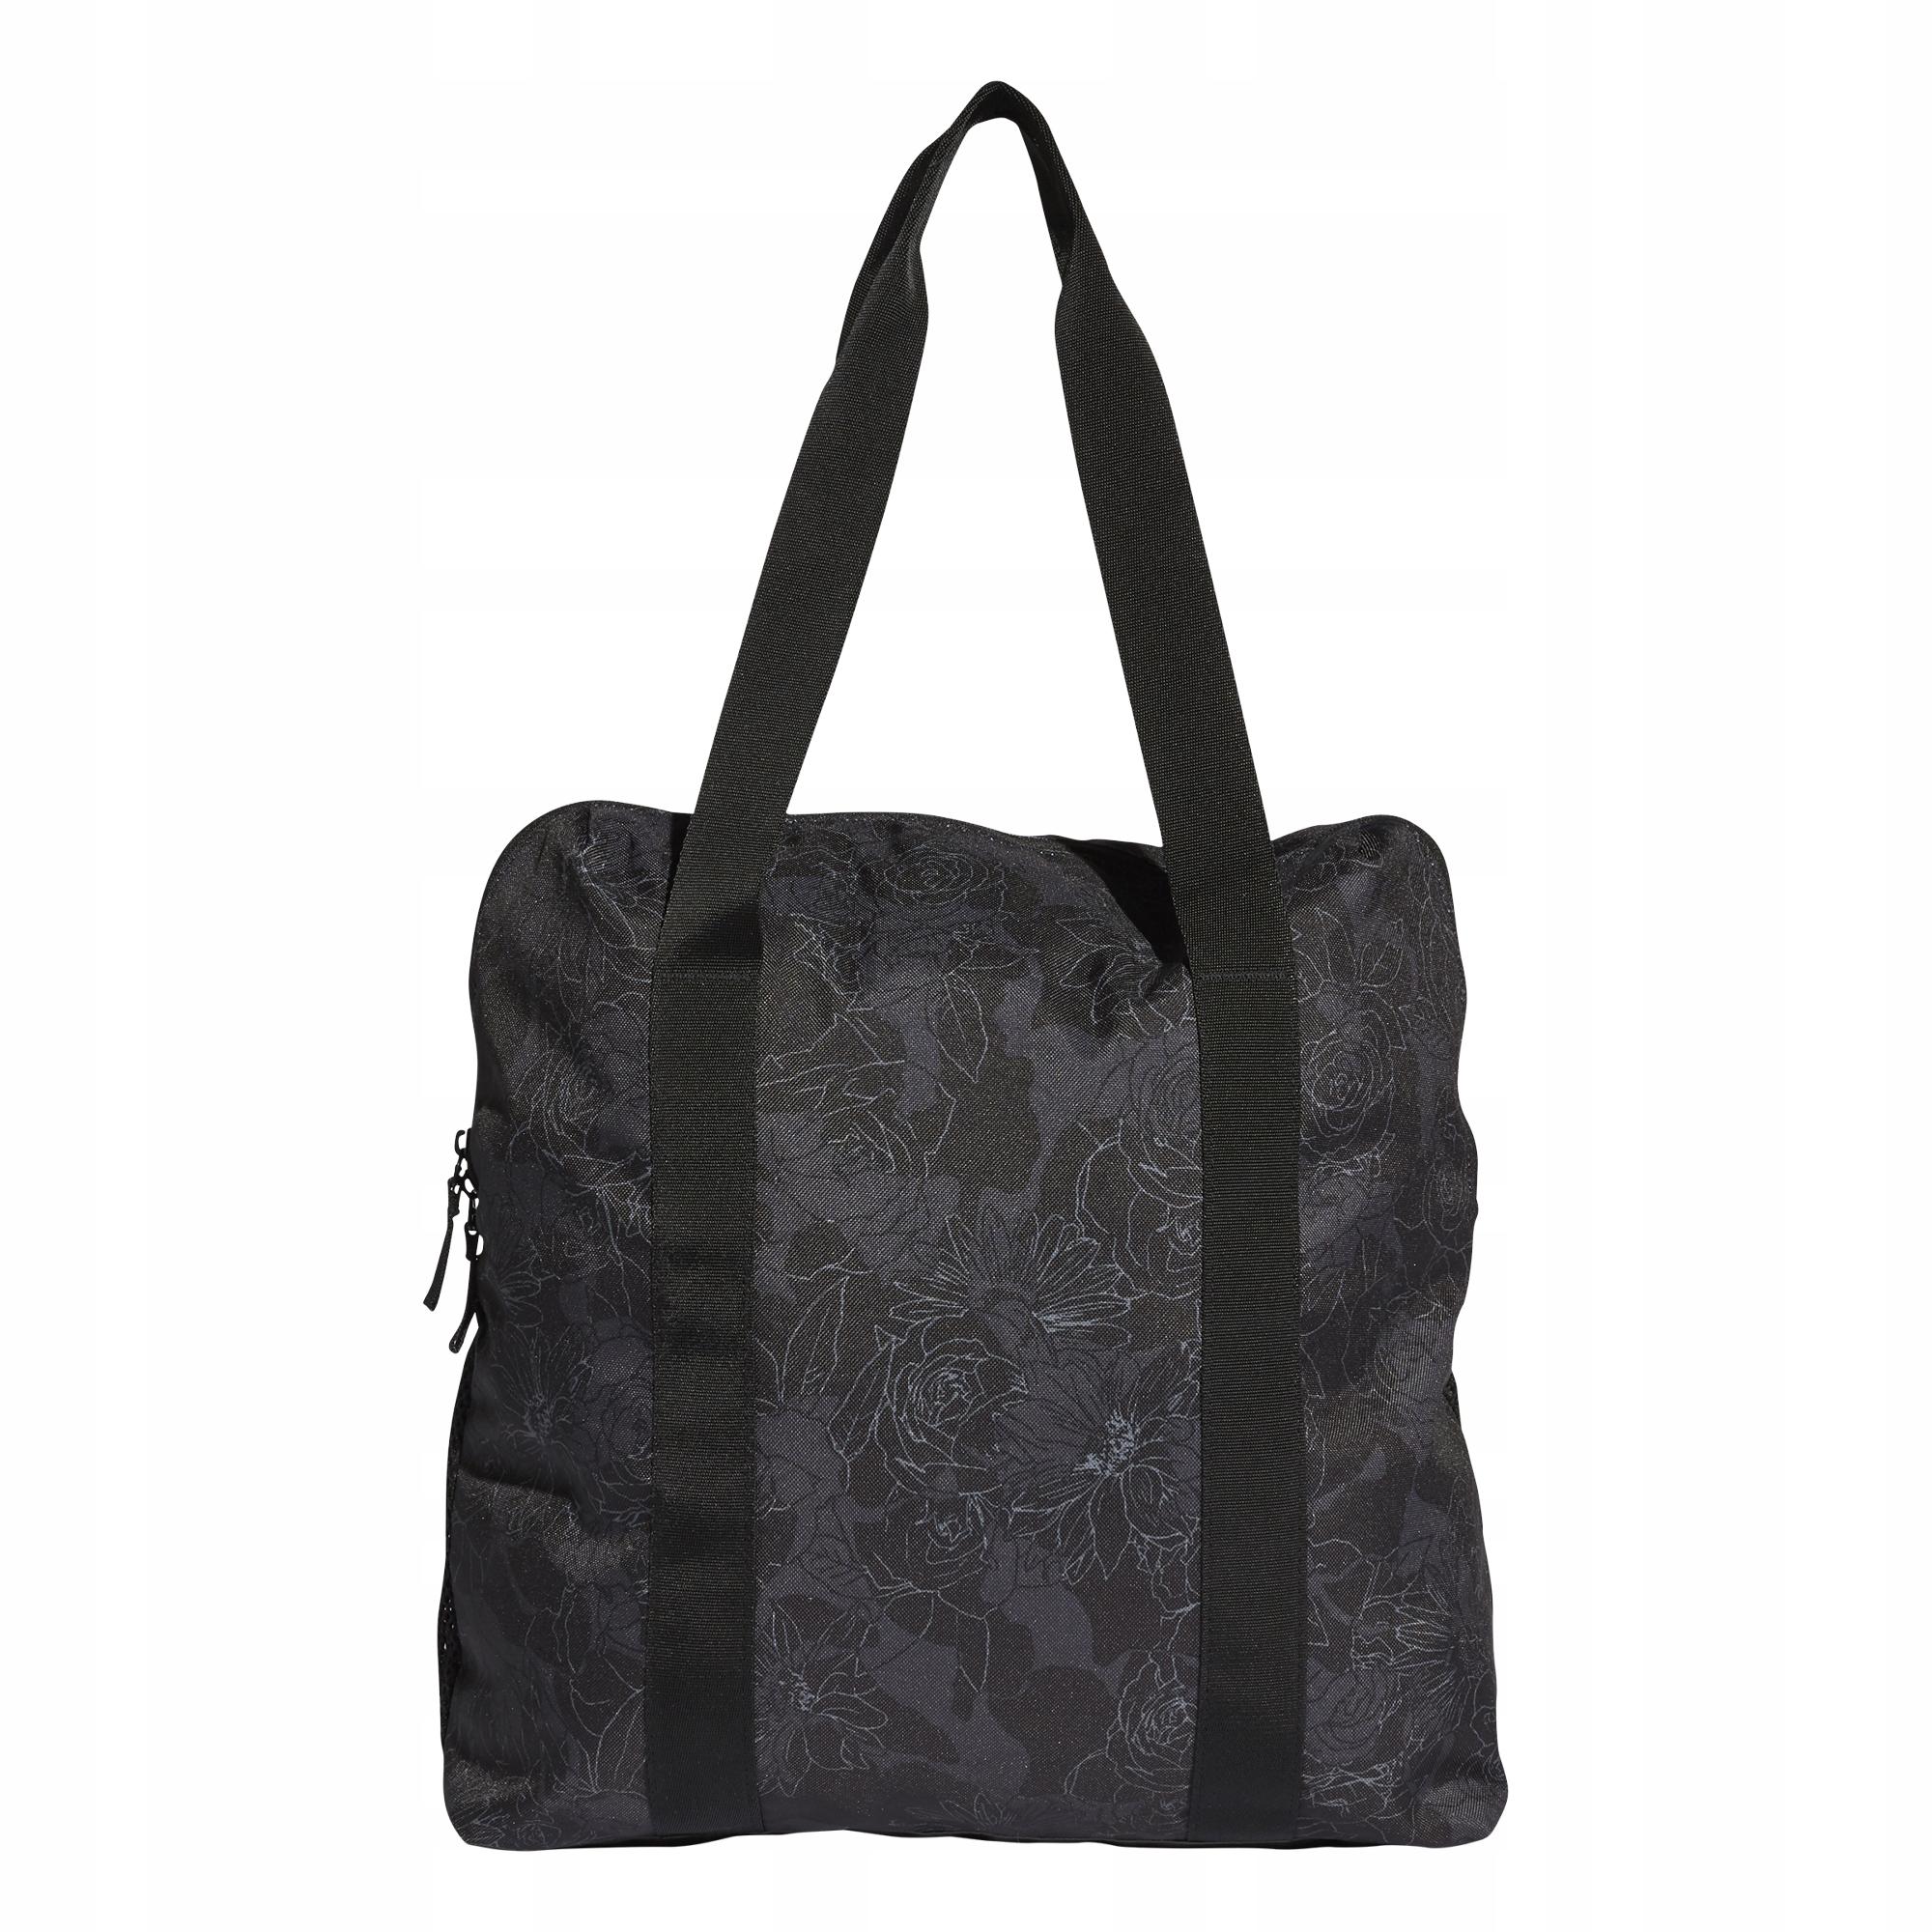 cc4027d29524b Torba Adidas Core Tote Bag (DM6150) r.NS - 7702706014 - oficjalne ...